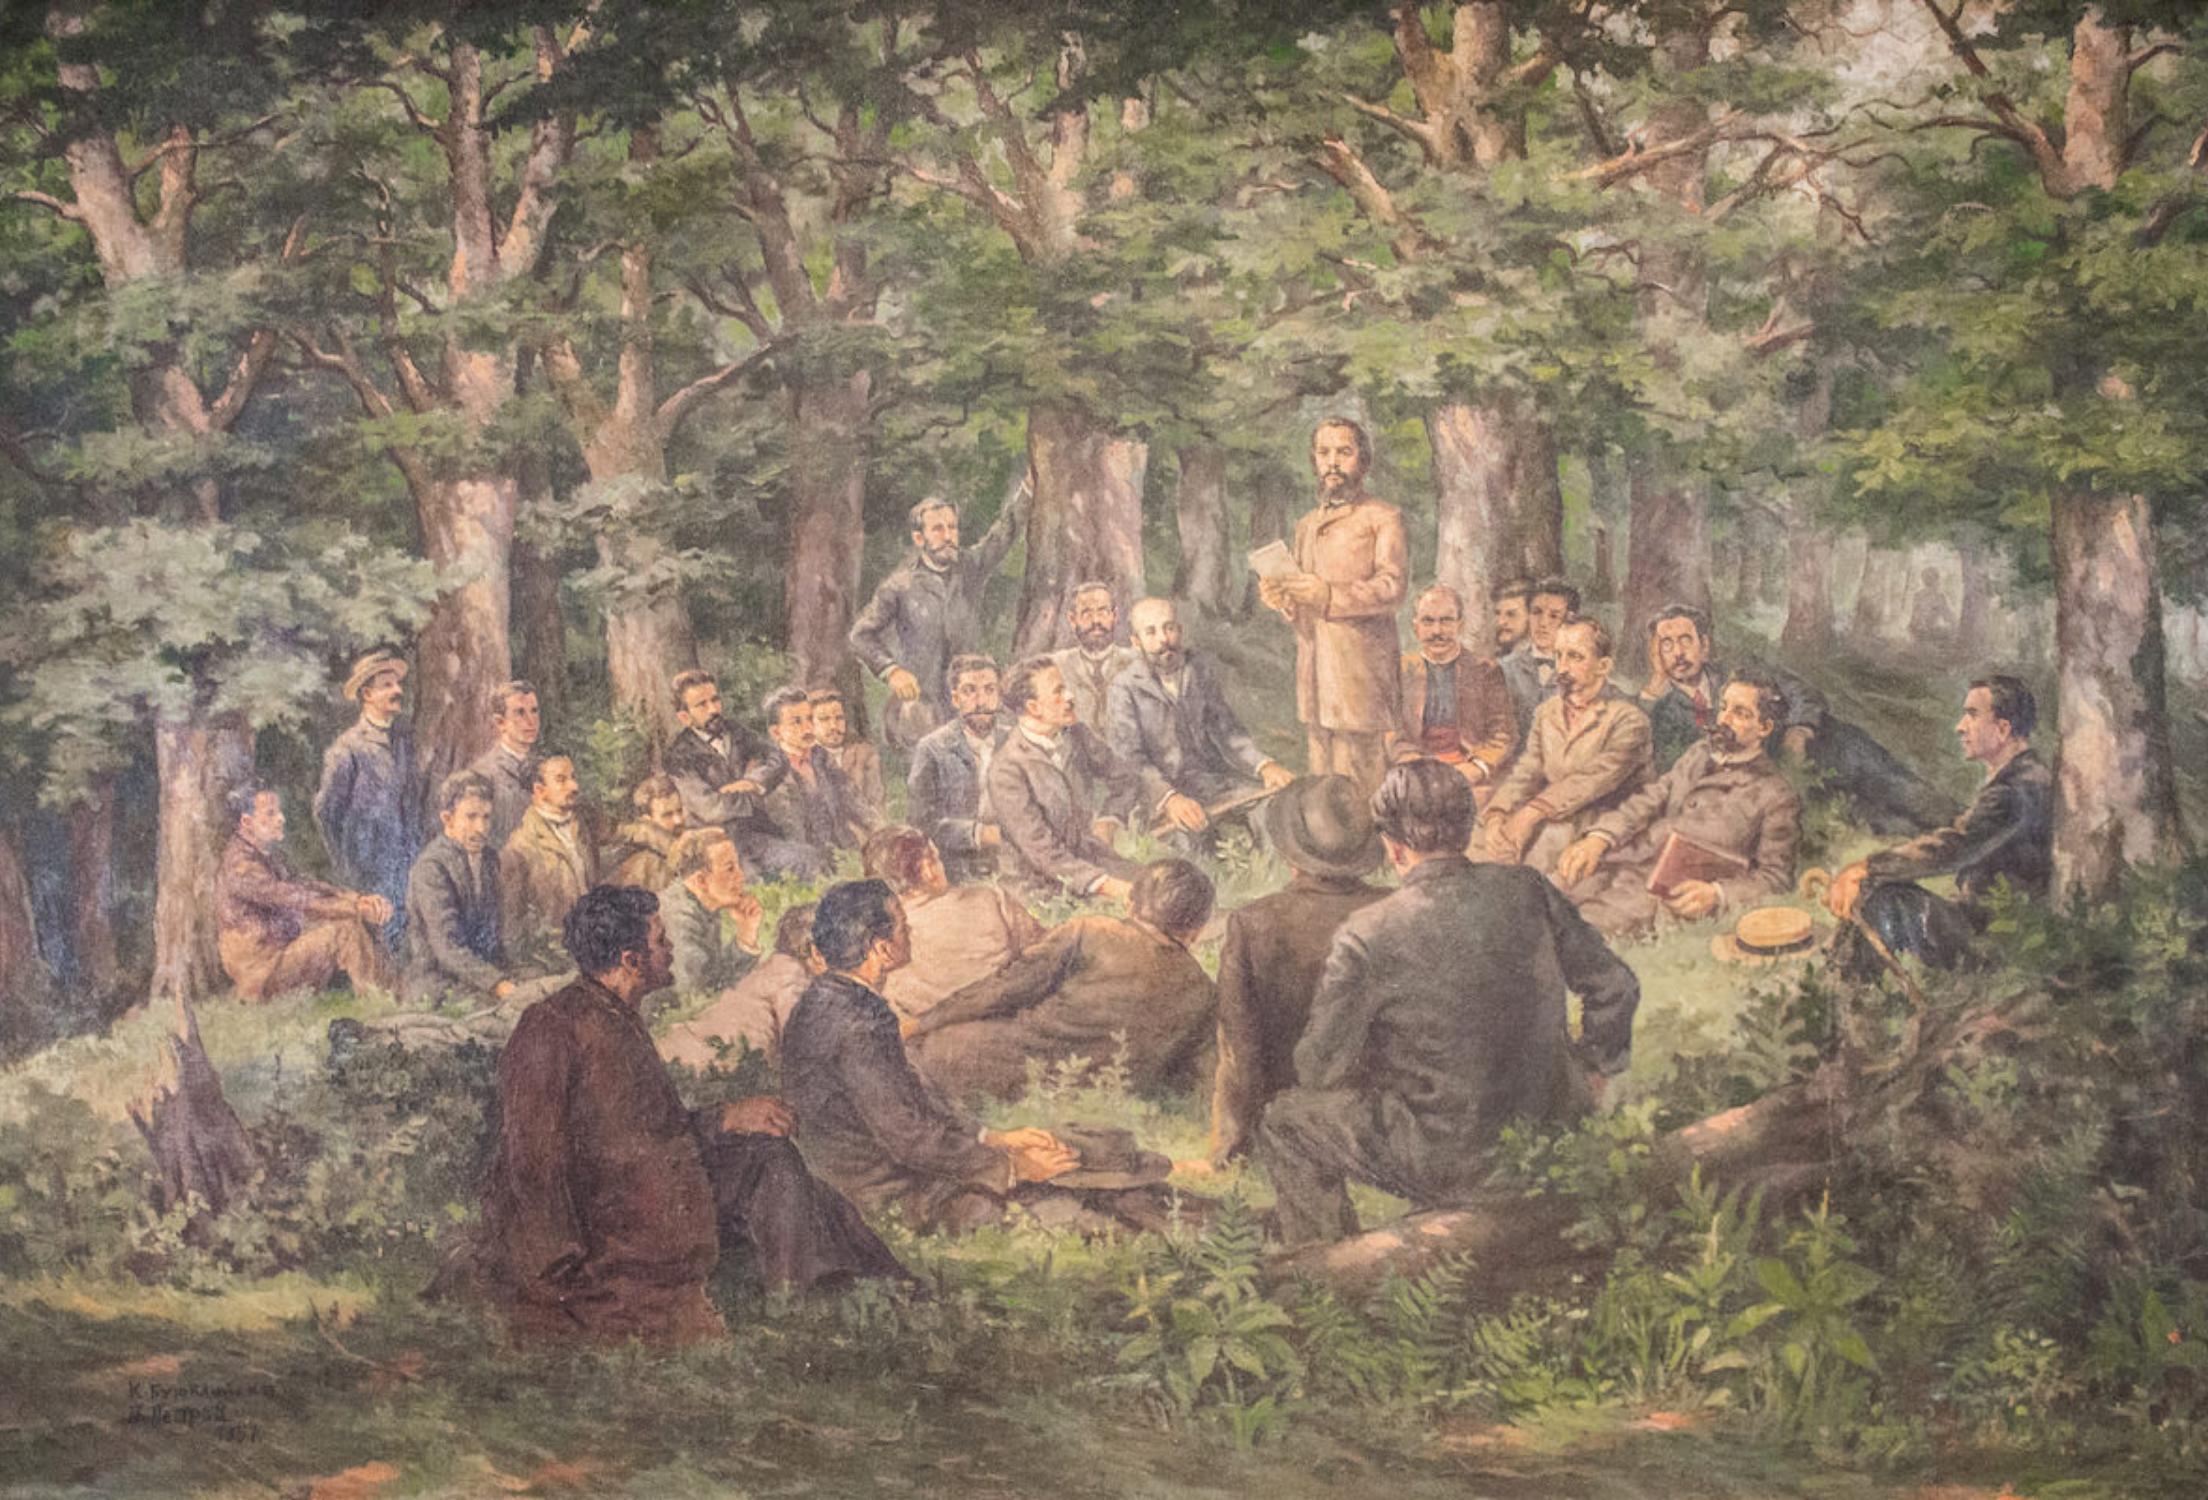 The 1891 Buzludzha Congress